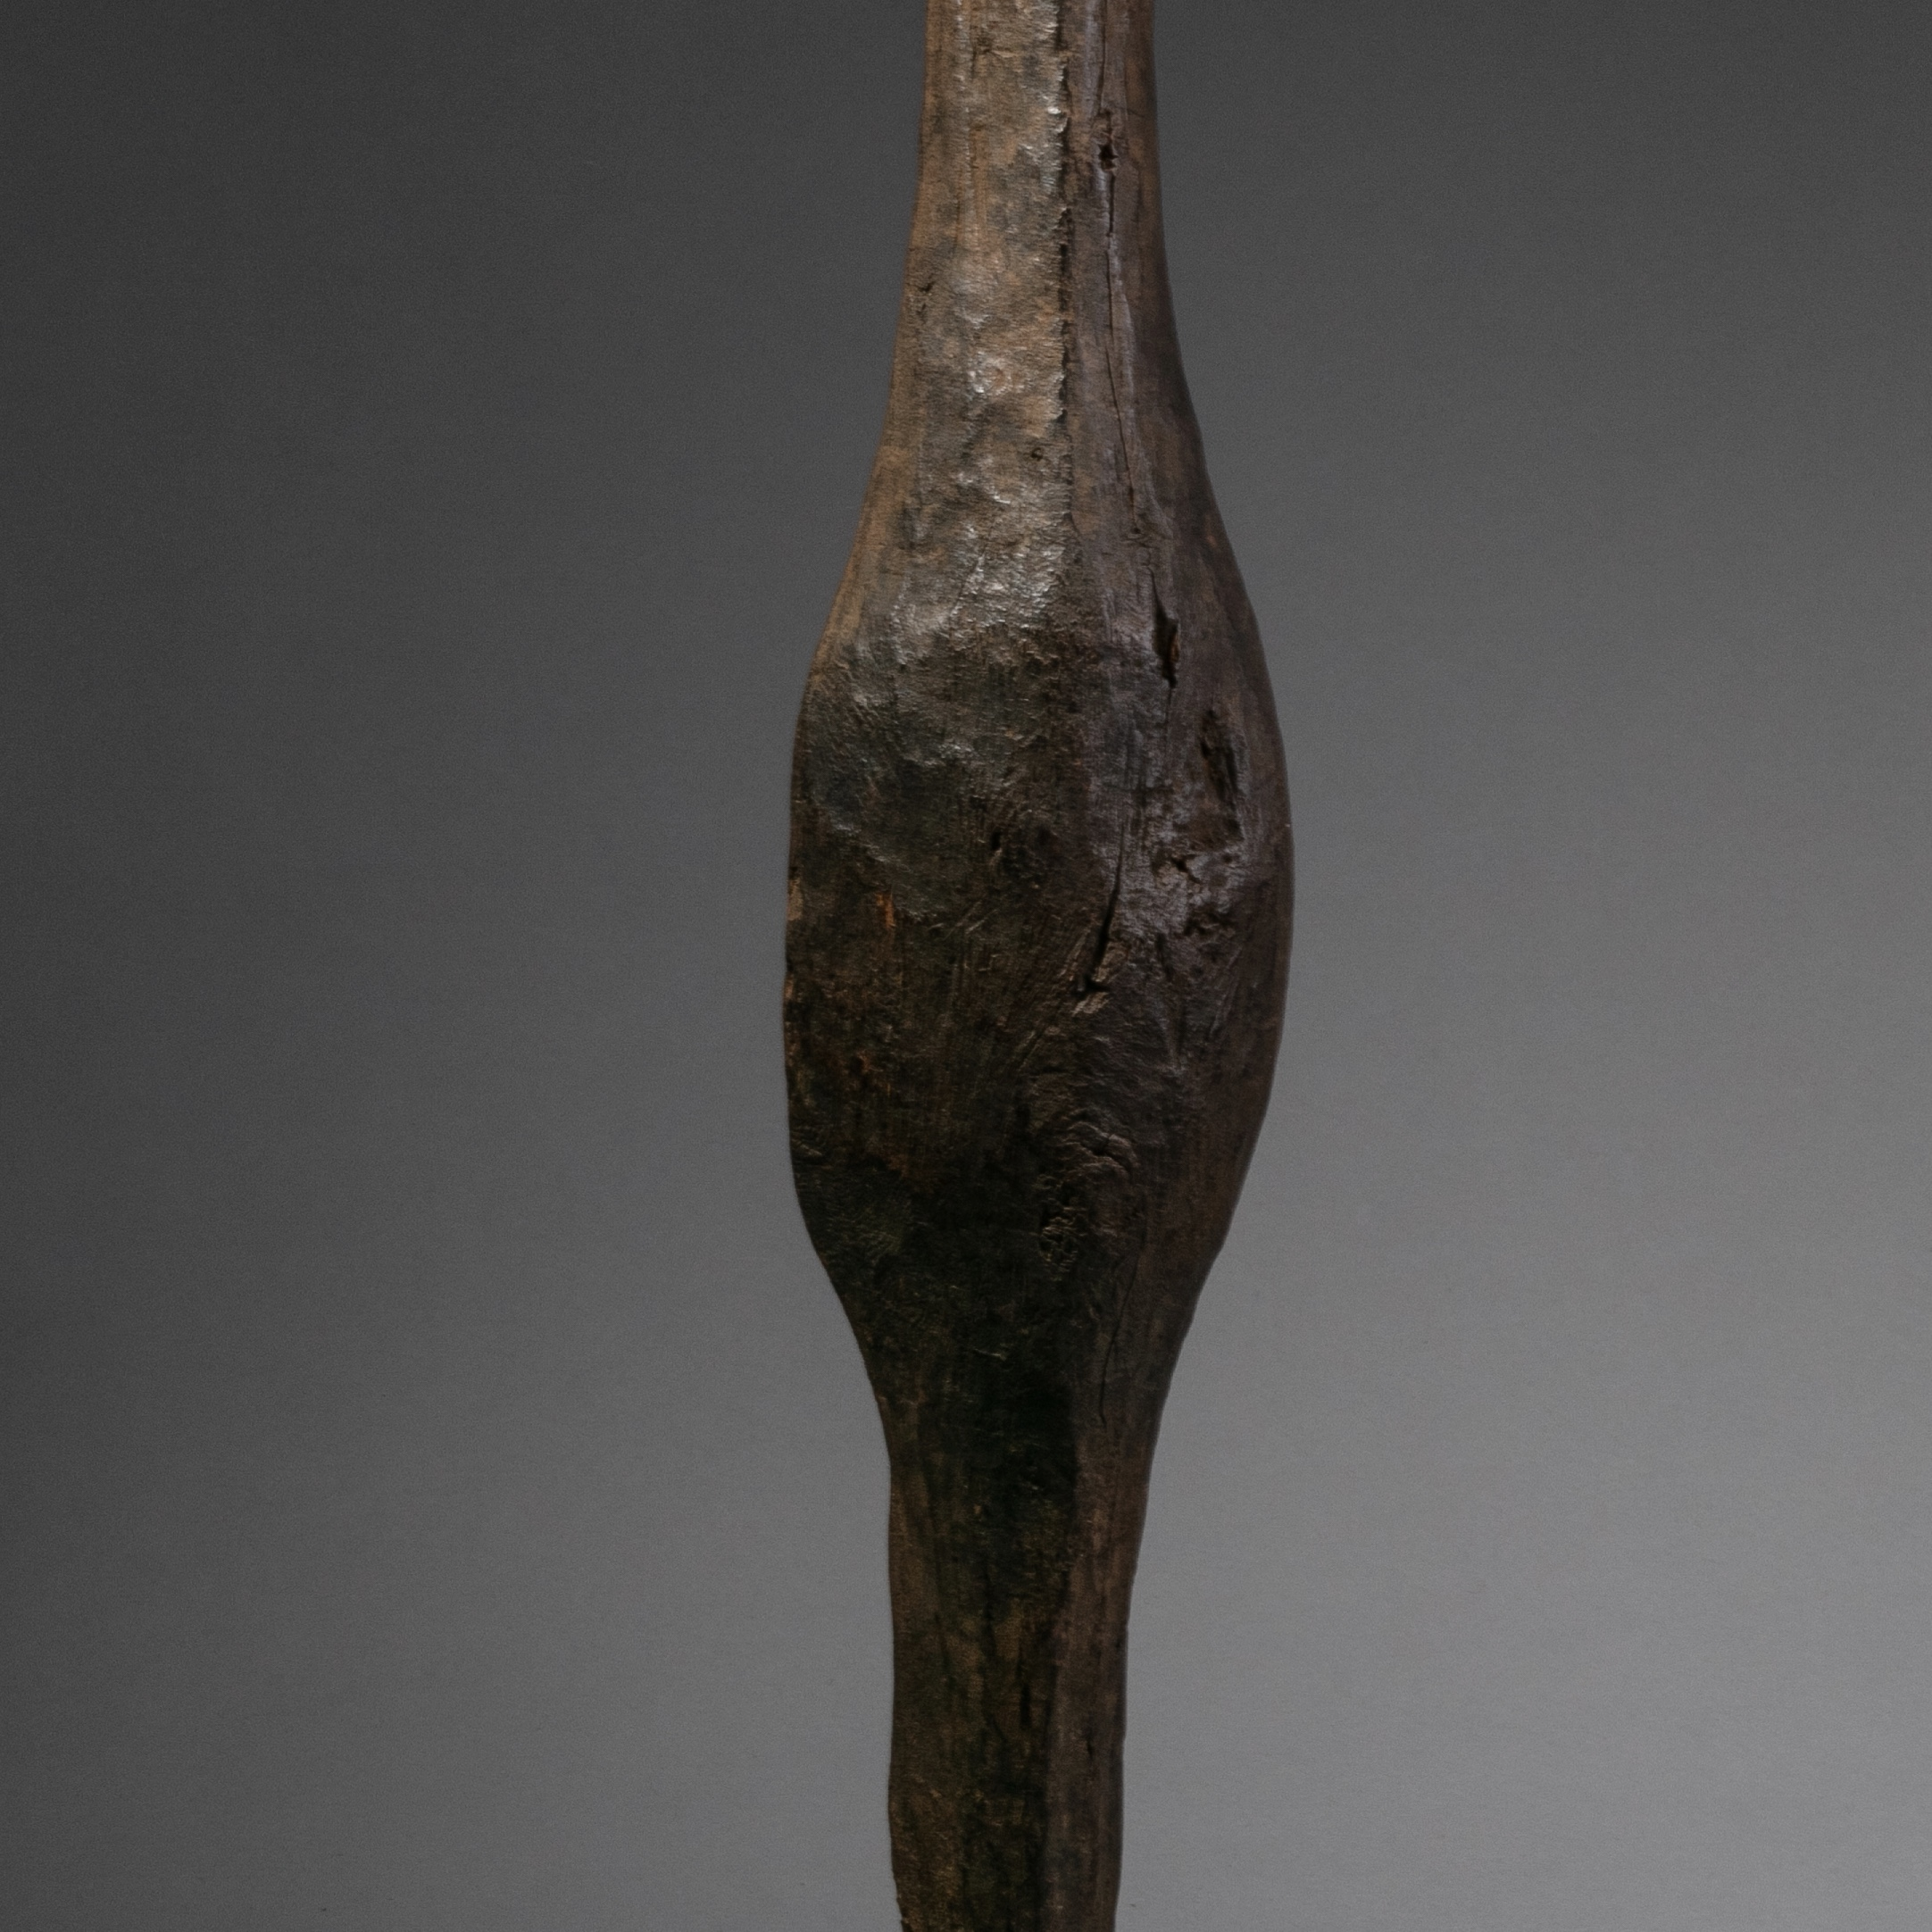 A CAVEMAN LIKE WOODEN SHIELD FROM SHI PEOPLE OF UGANDA ( No 1016 )